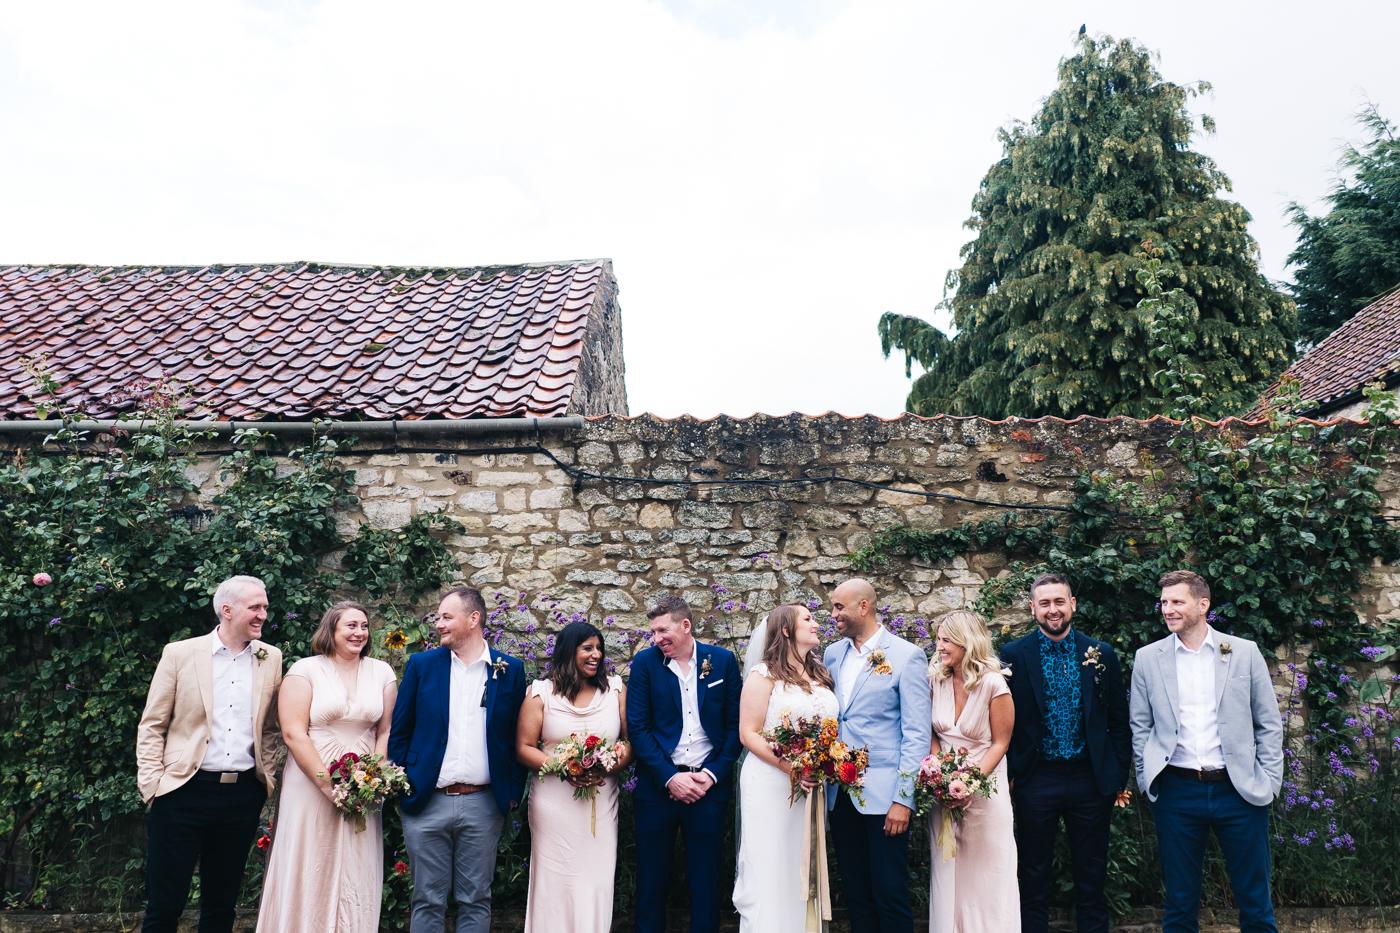 wedding-at-the-pheasant-harome-helmsley-north-yorkshire-wedding-photographer-0025.jpg